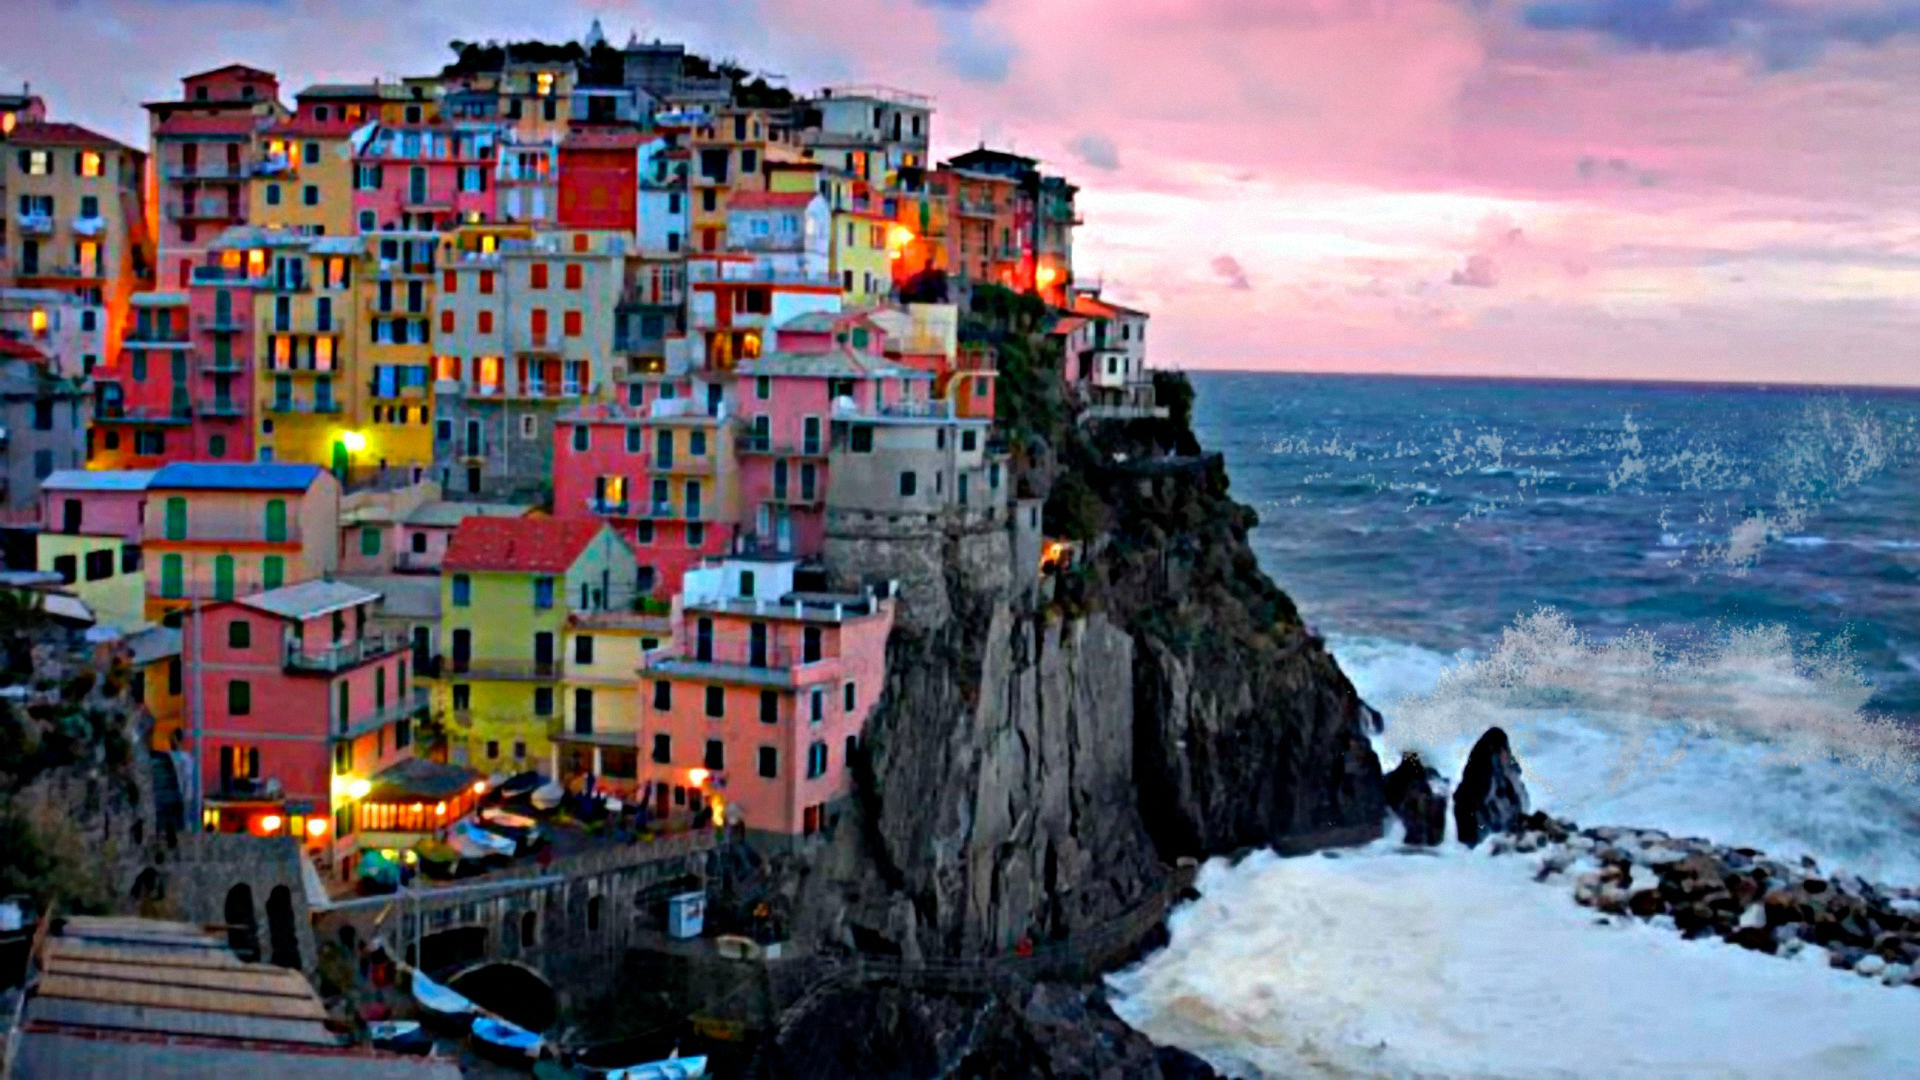 Обои дома, скалы, Пейзаж, Manarola, italy, побережье. Города